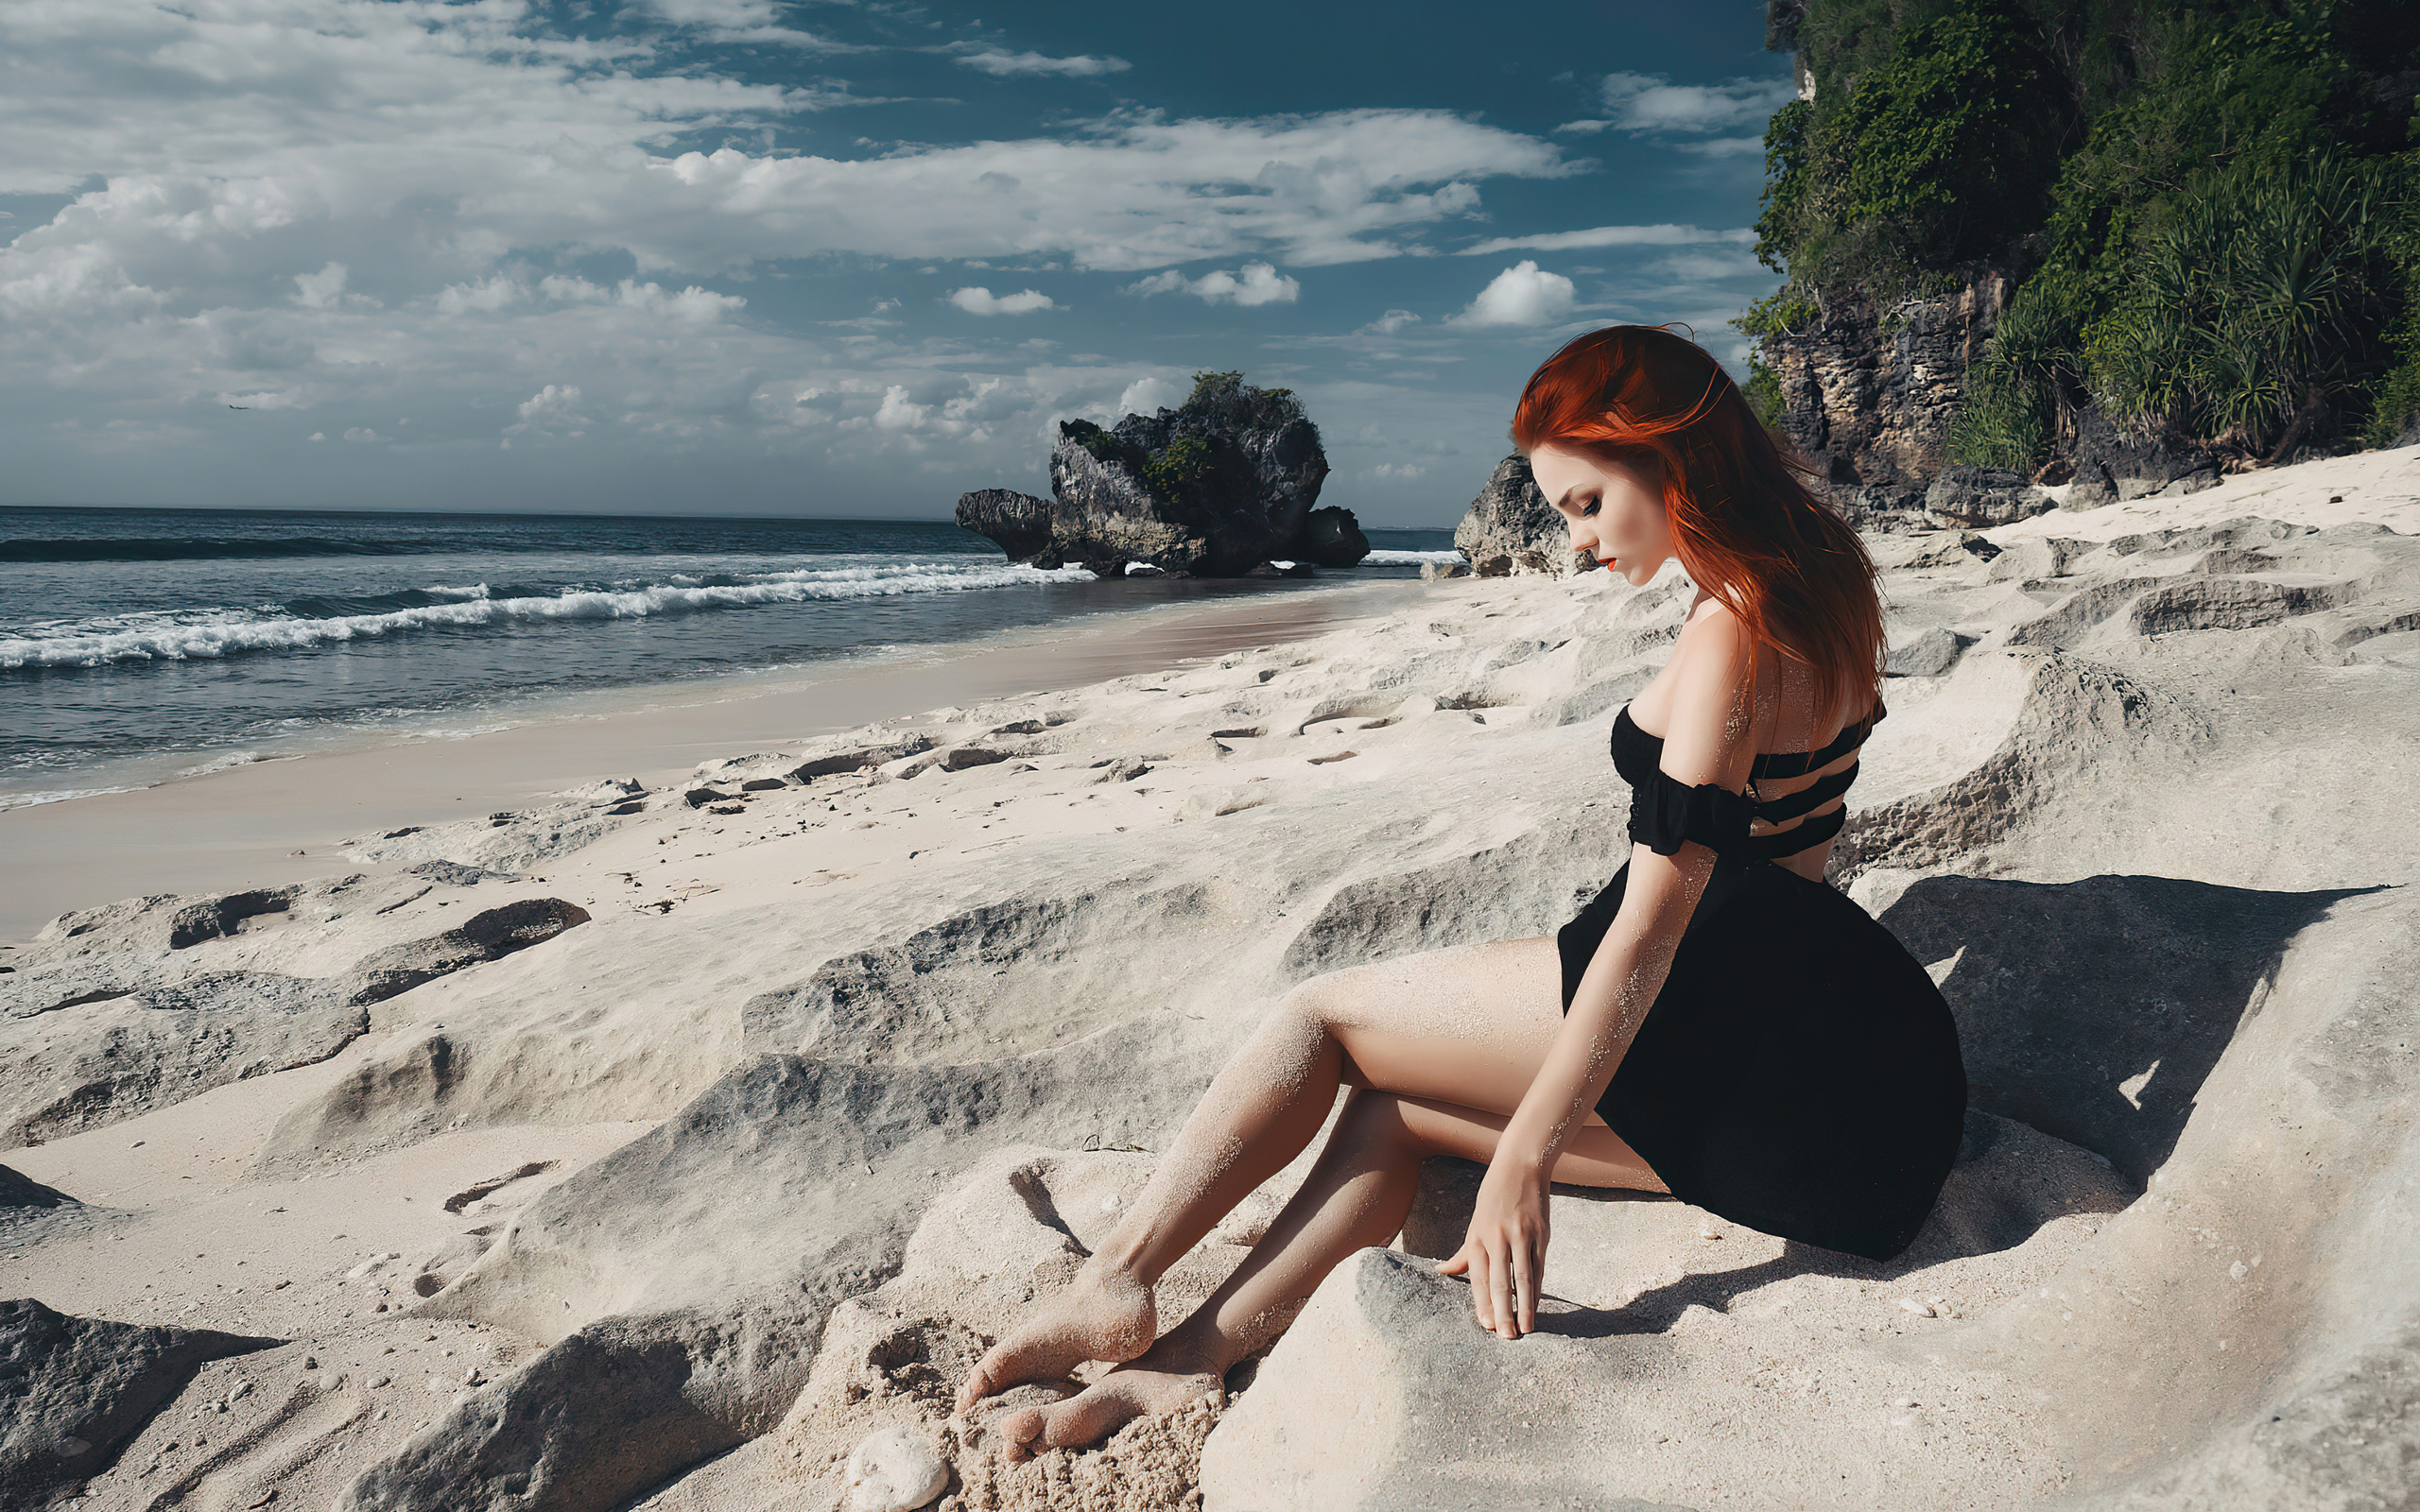 redhead-girl-sitting-on-beach-black-clothing-4k-tc.jpg